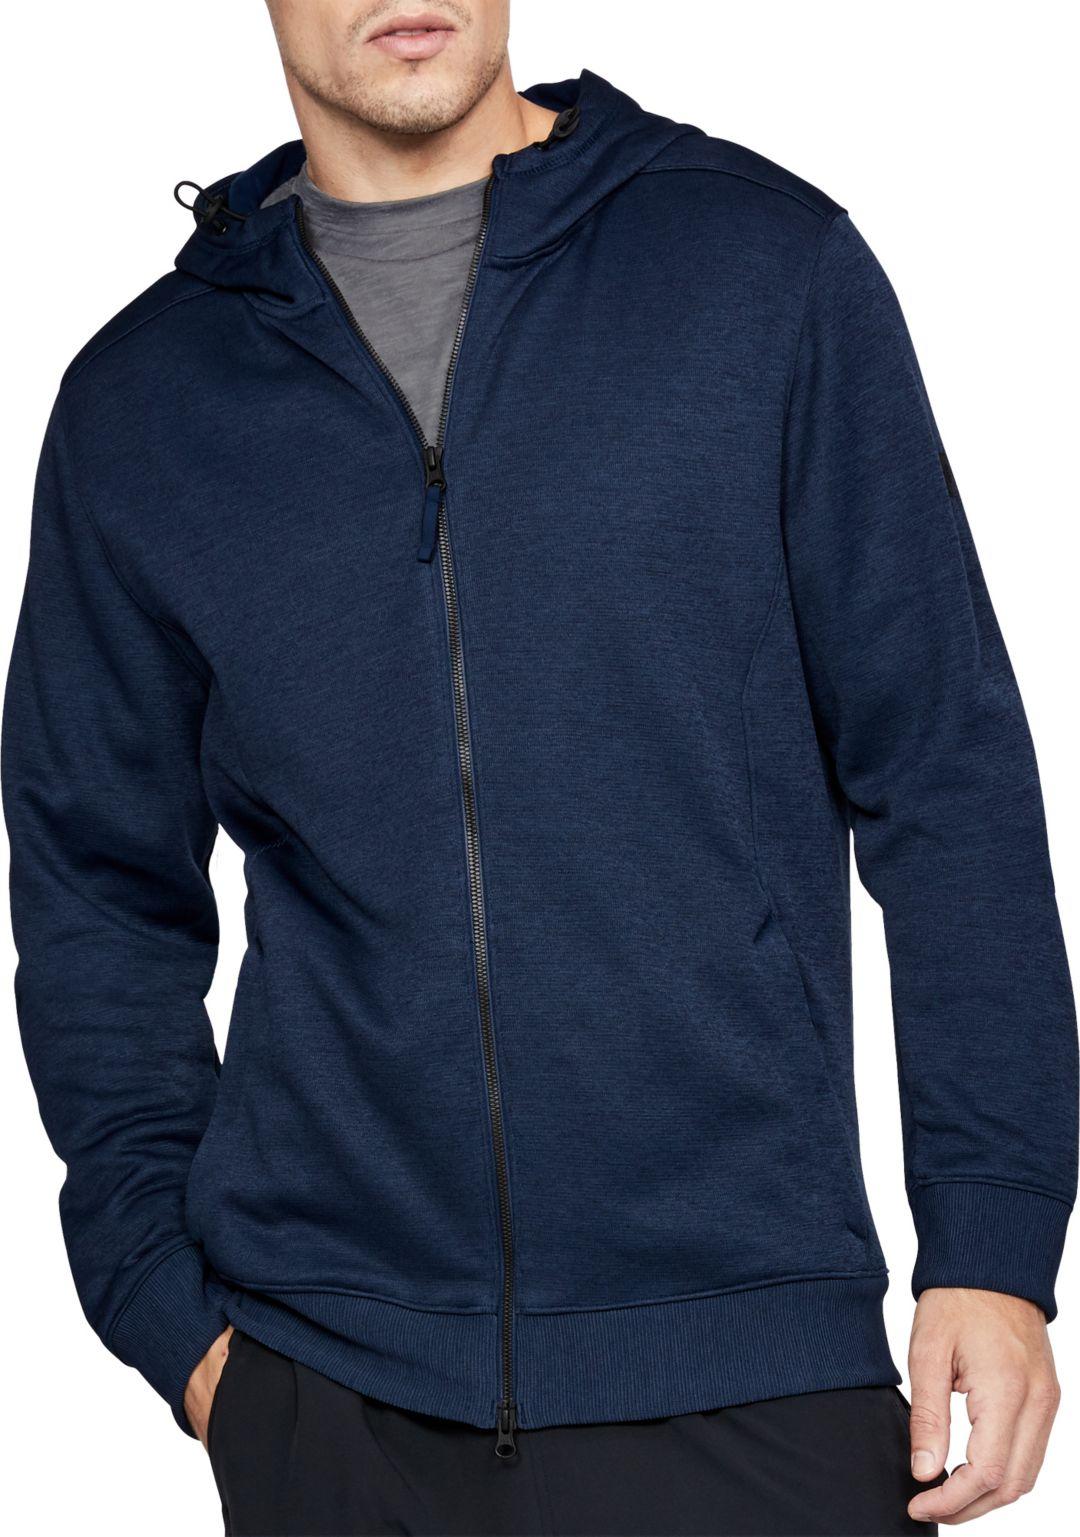 820cbd26 Under Armour Men's Sportstyle Sweater Fleece Full-Zip Long Sleeve T-Shirt